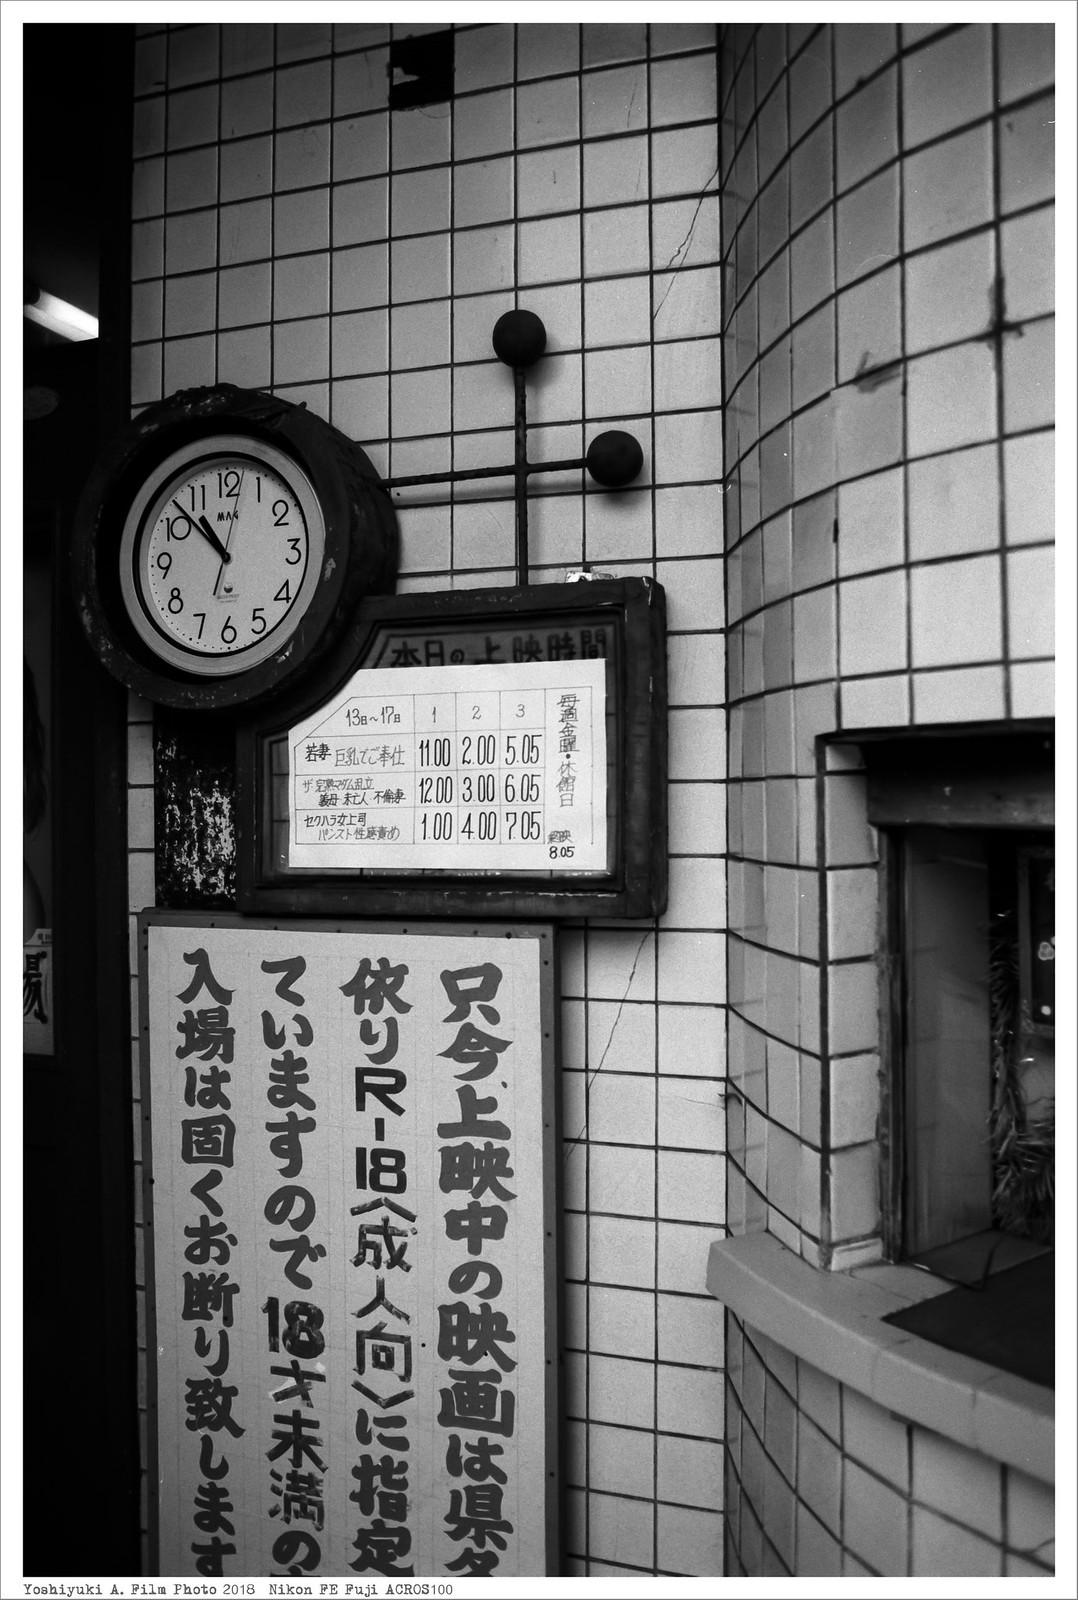 北九州市八幡 有楽映画劇場 Nikon_FE_Fuji_Acros100__88